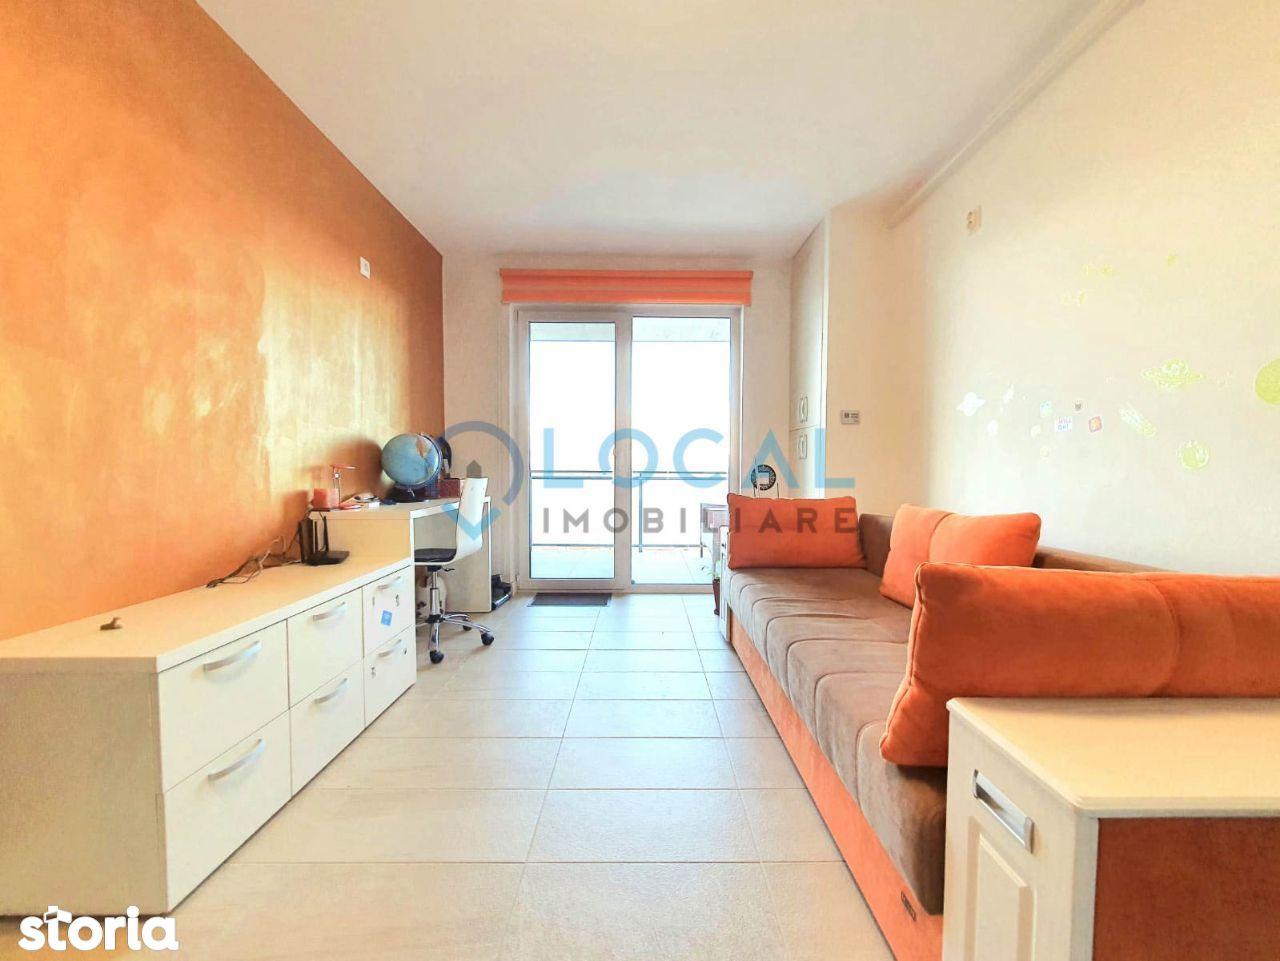 Apartament 2 camere, Semidecomandat, Modern, Parcare Buna Ziua